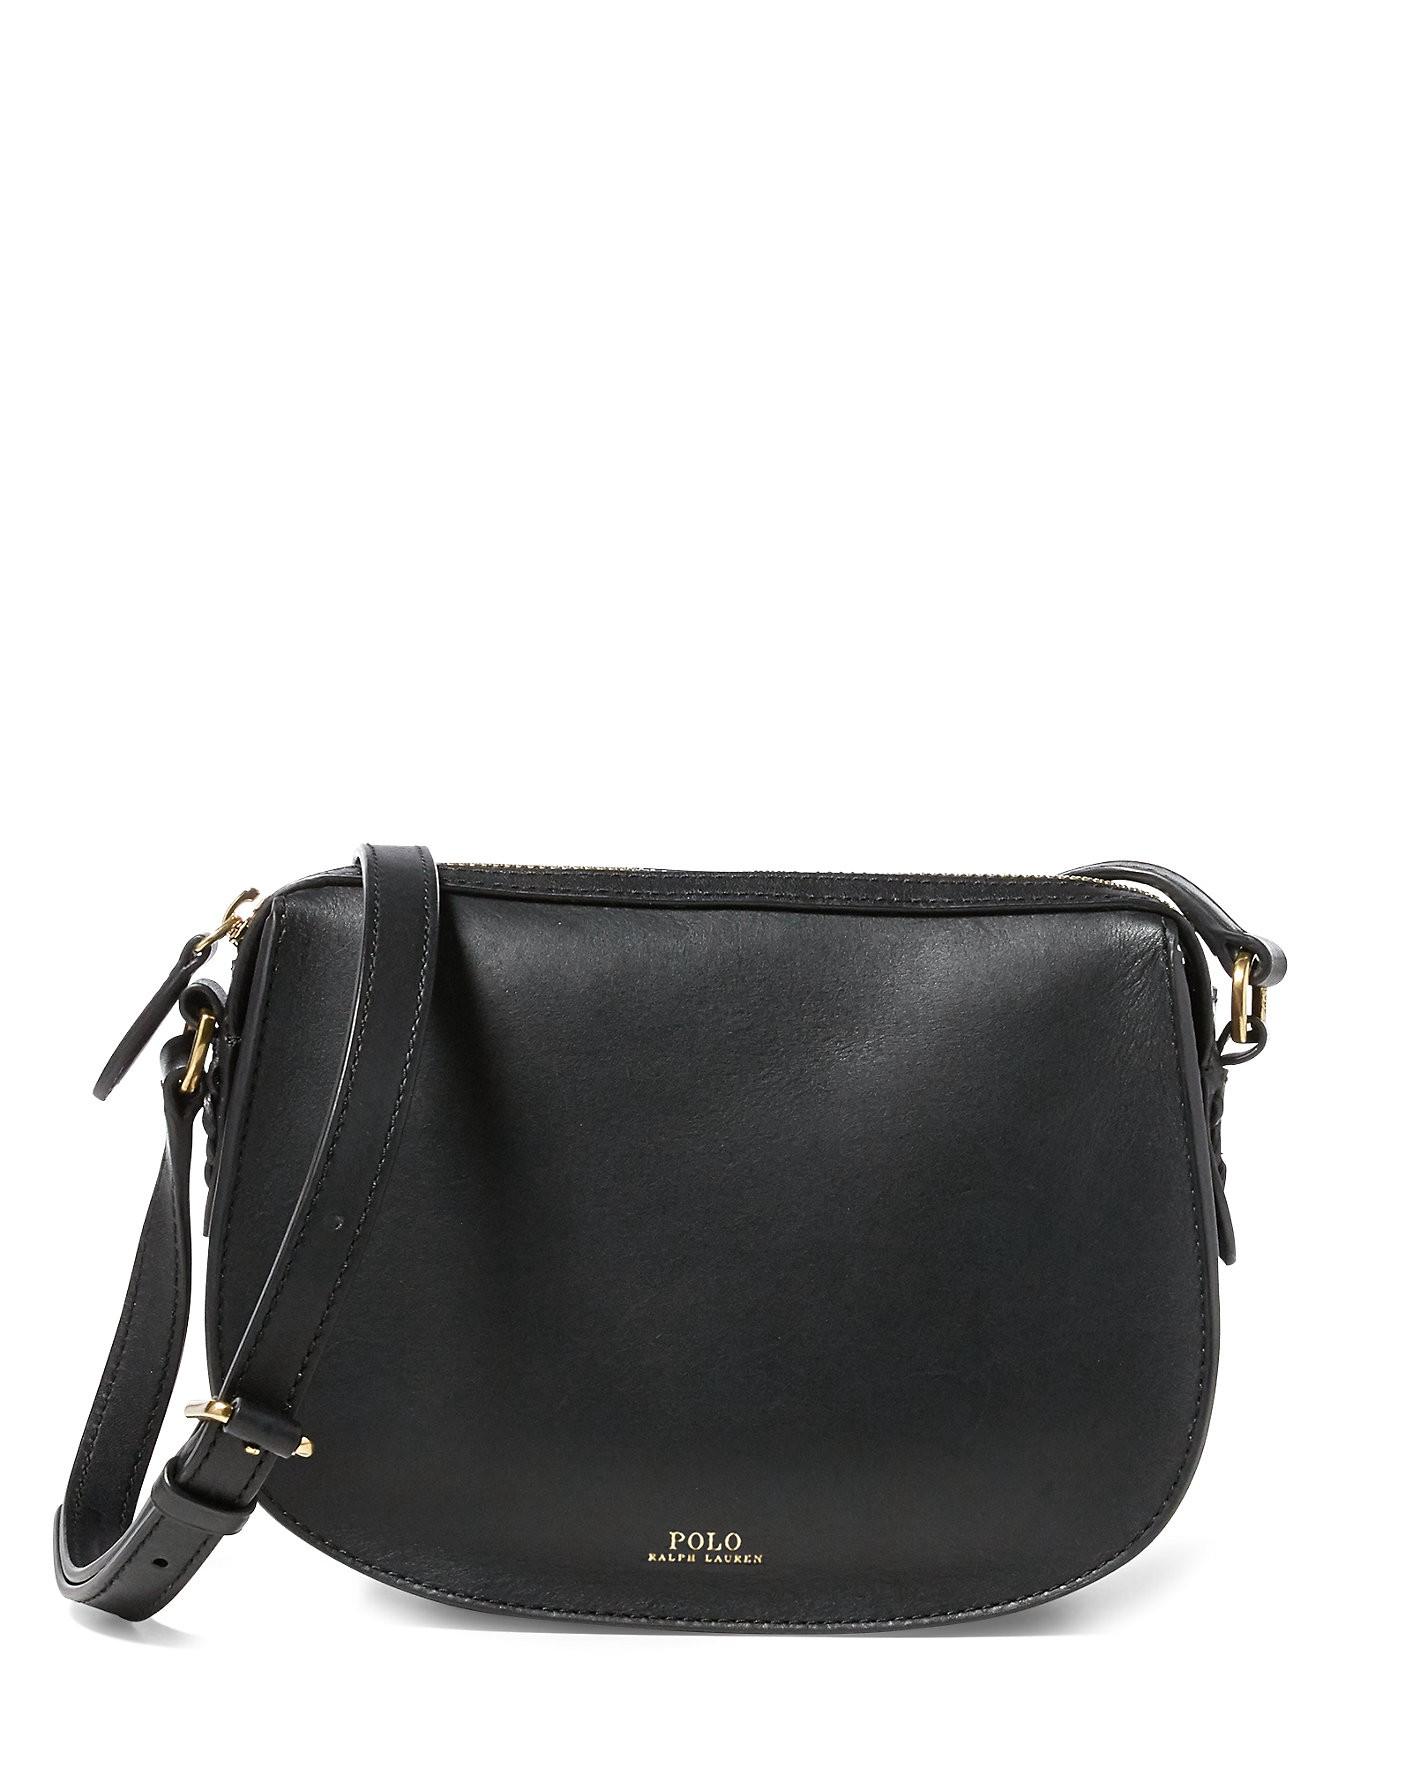 Ralph Lauren Polo Leather Mini Crossbody Bag In Black  df4f0009ac95a